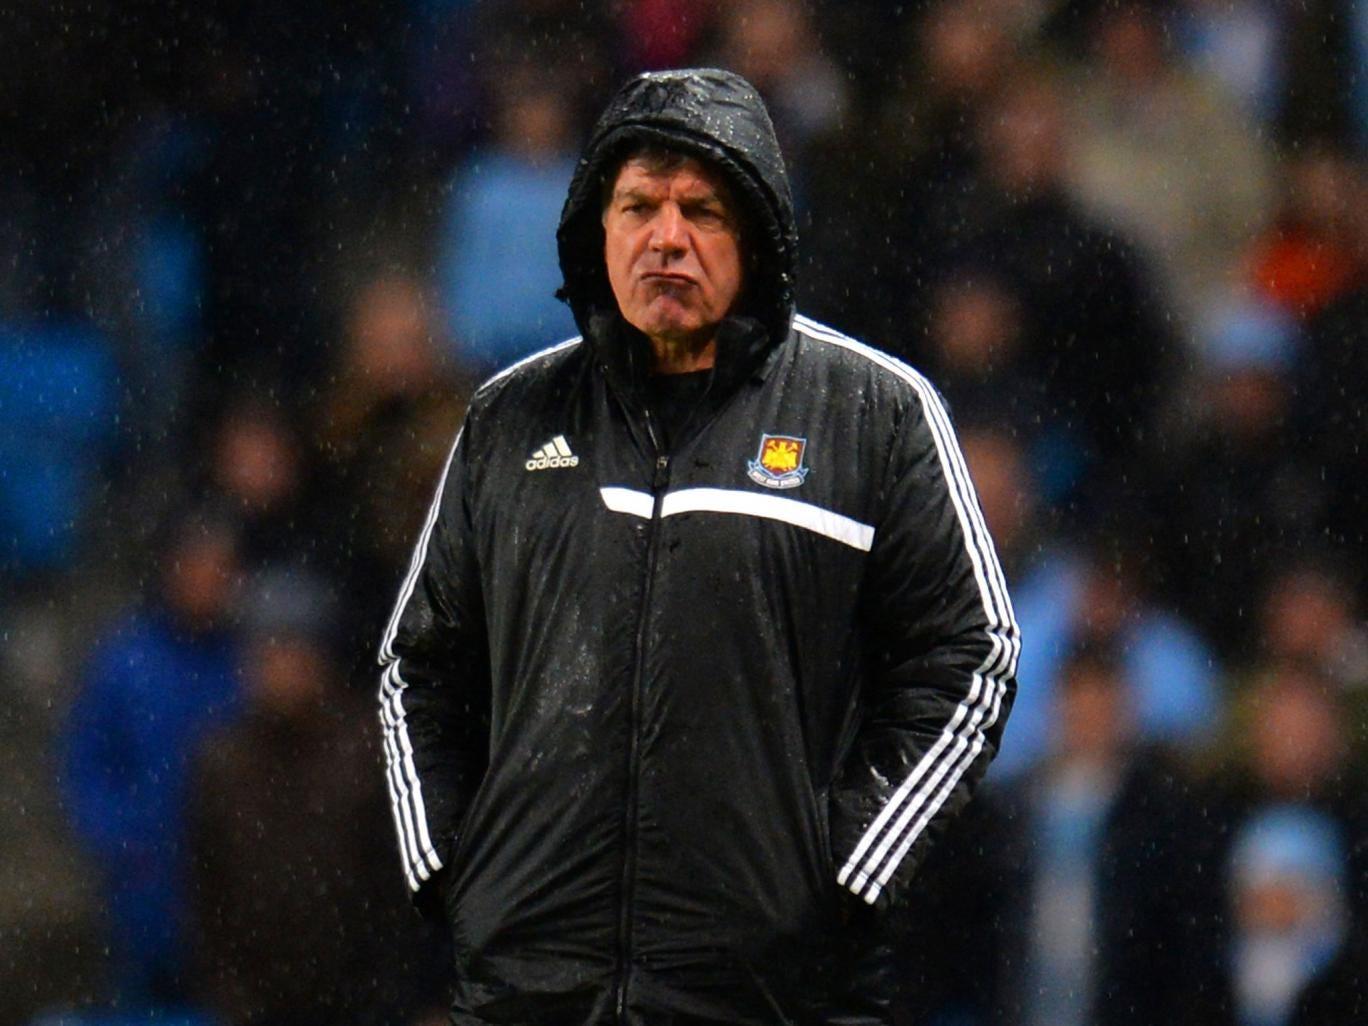 Sam Allardyce looks on during West Ham's 6-0 thrashing at Manchester City on Wednesday